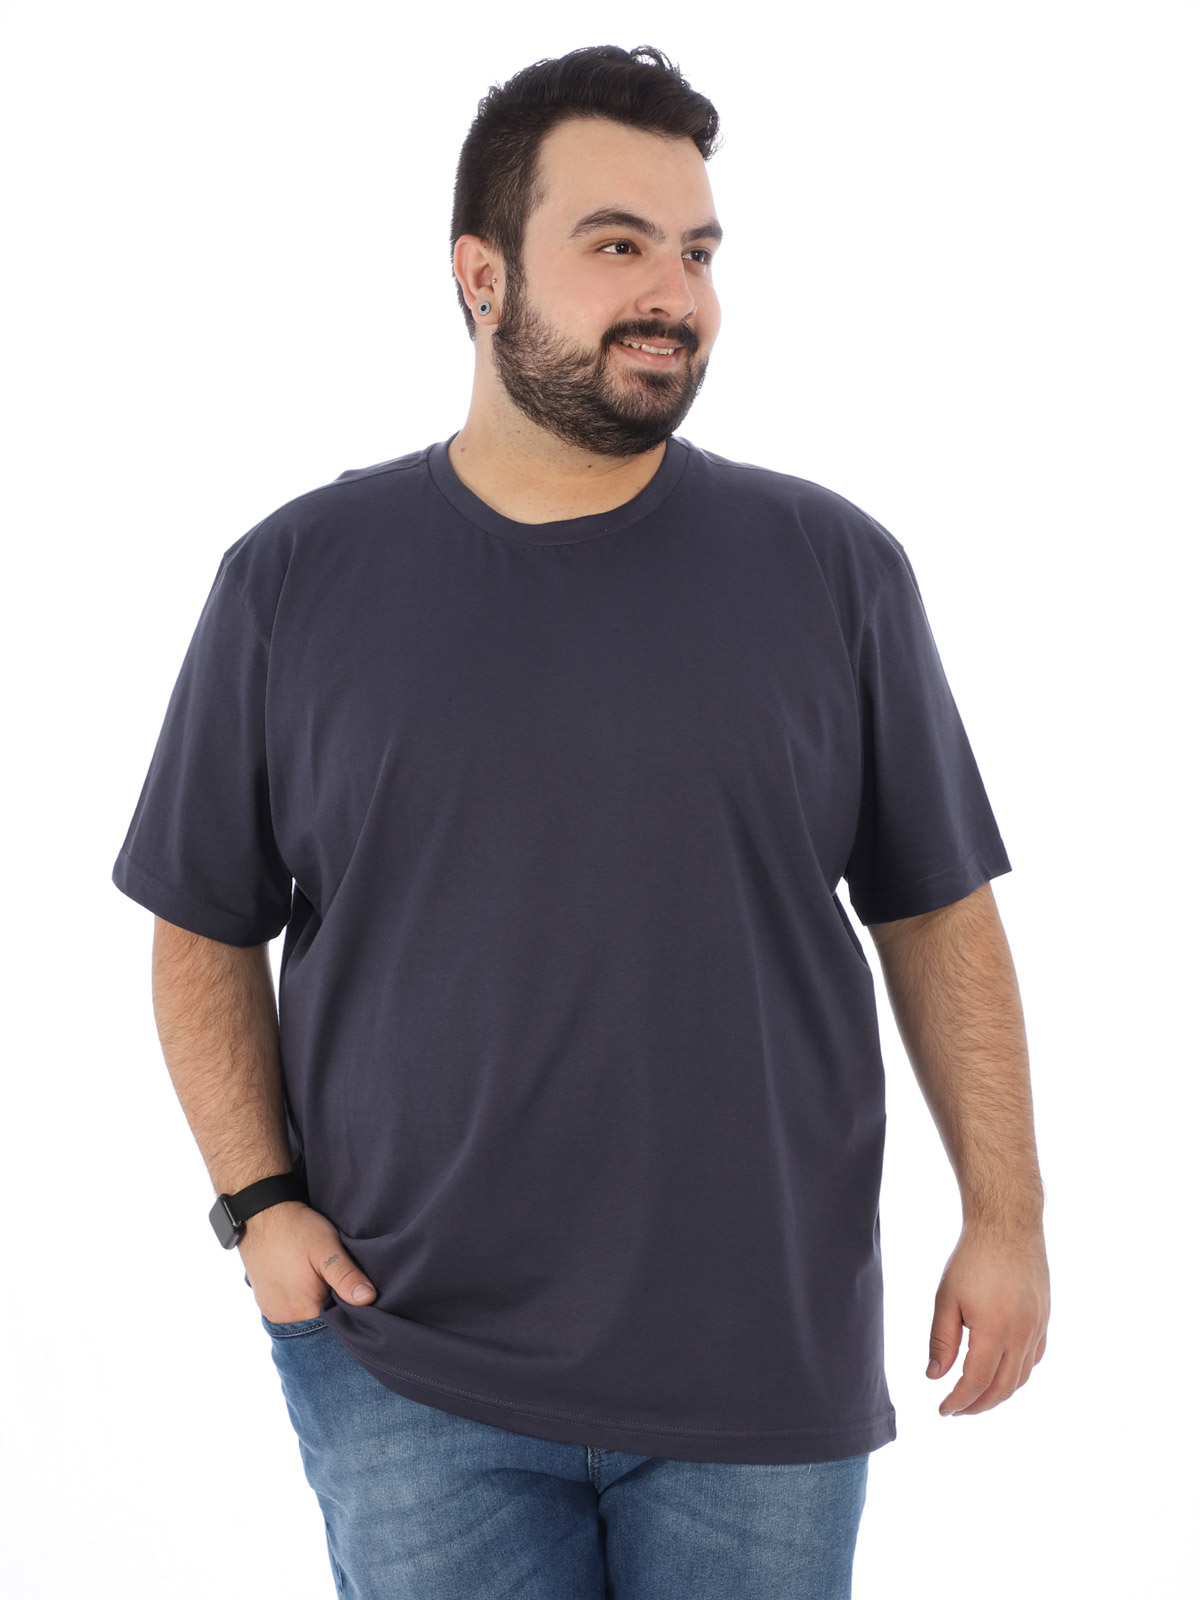 Camiseta Plus Size Lisa Masculino Básica Algodão Grafite